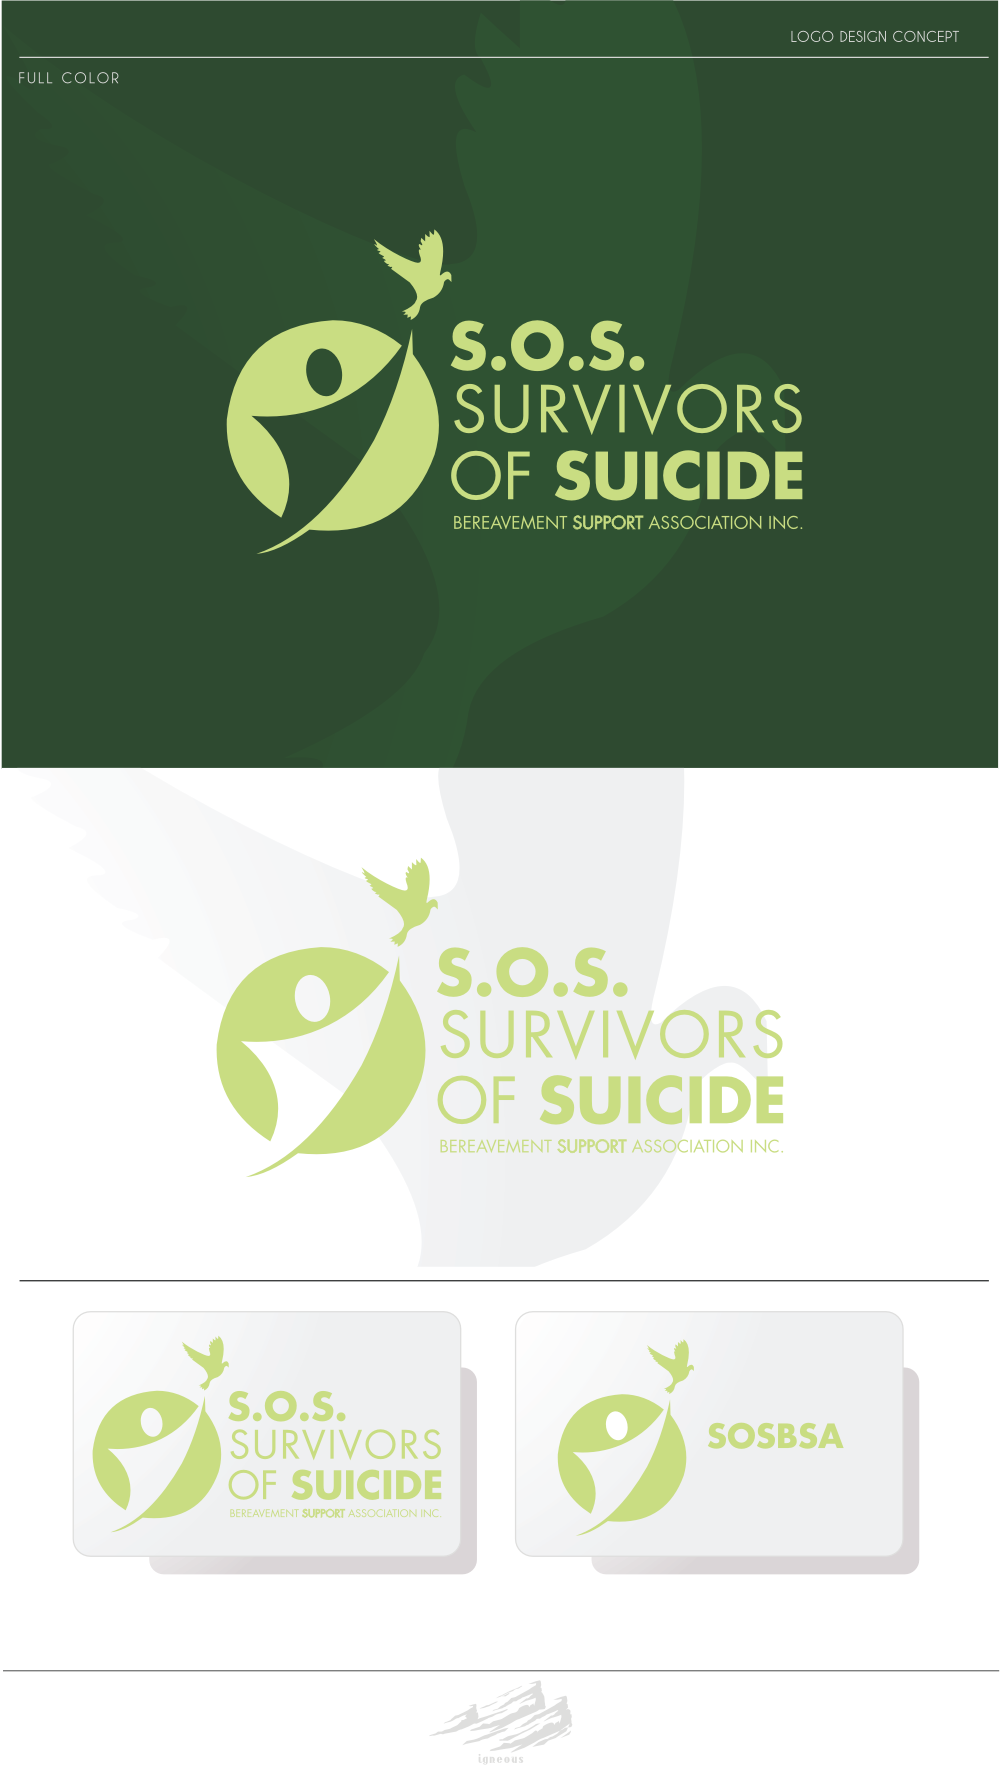 S.O.S. Survivors of Suicide Bereavement Support Association Inc. (SOSBSA) needs a new logo